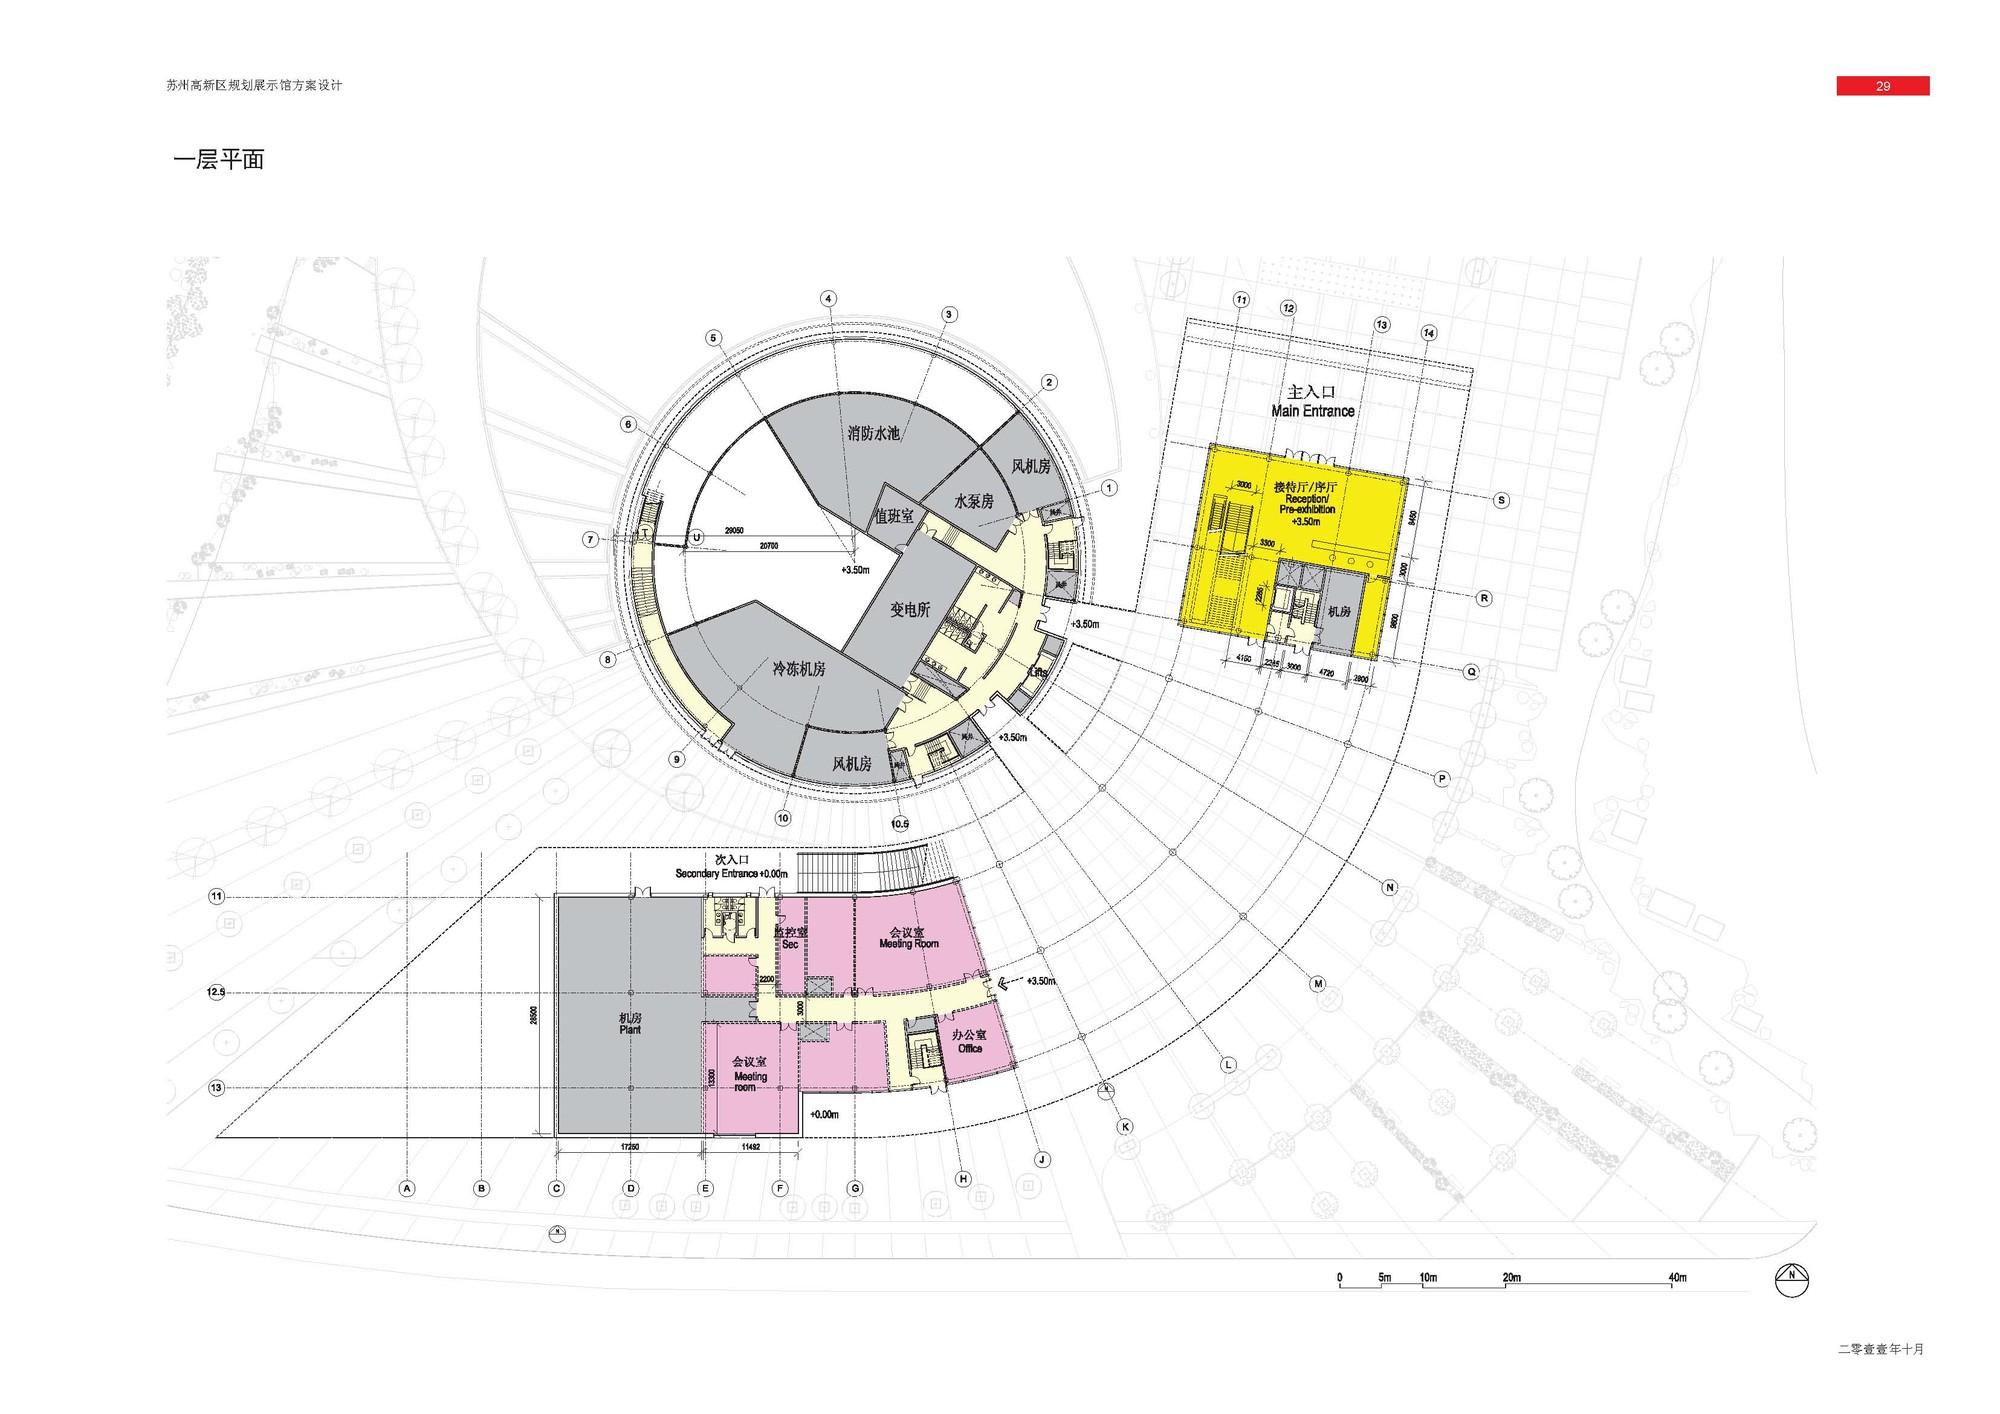 Suzhou snd district urban planning exhibition hall bdp for Blueprint design program